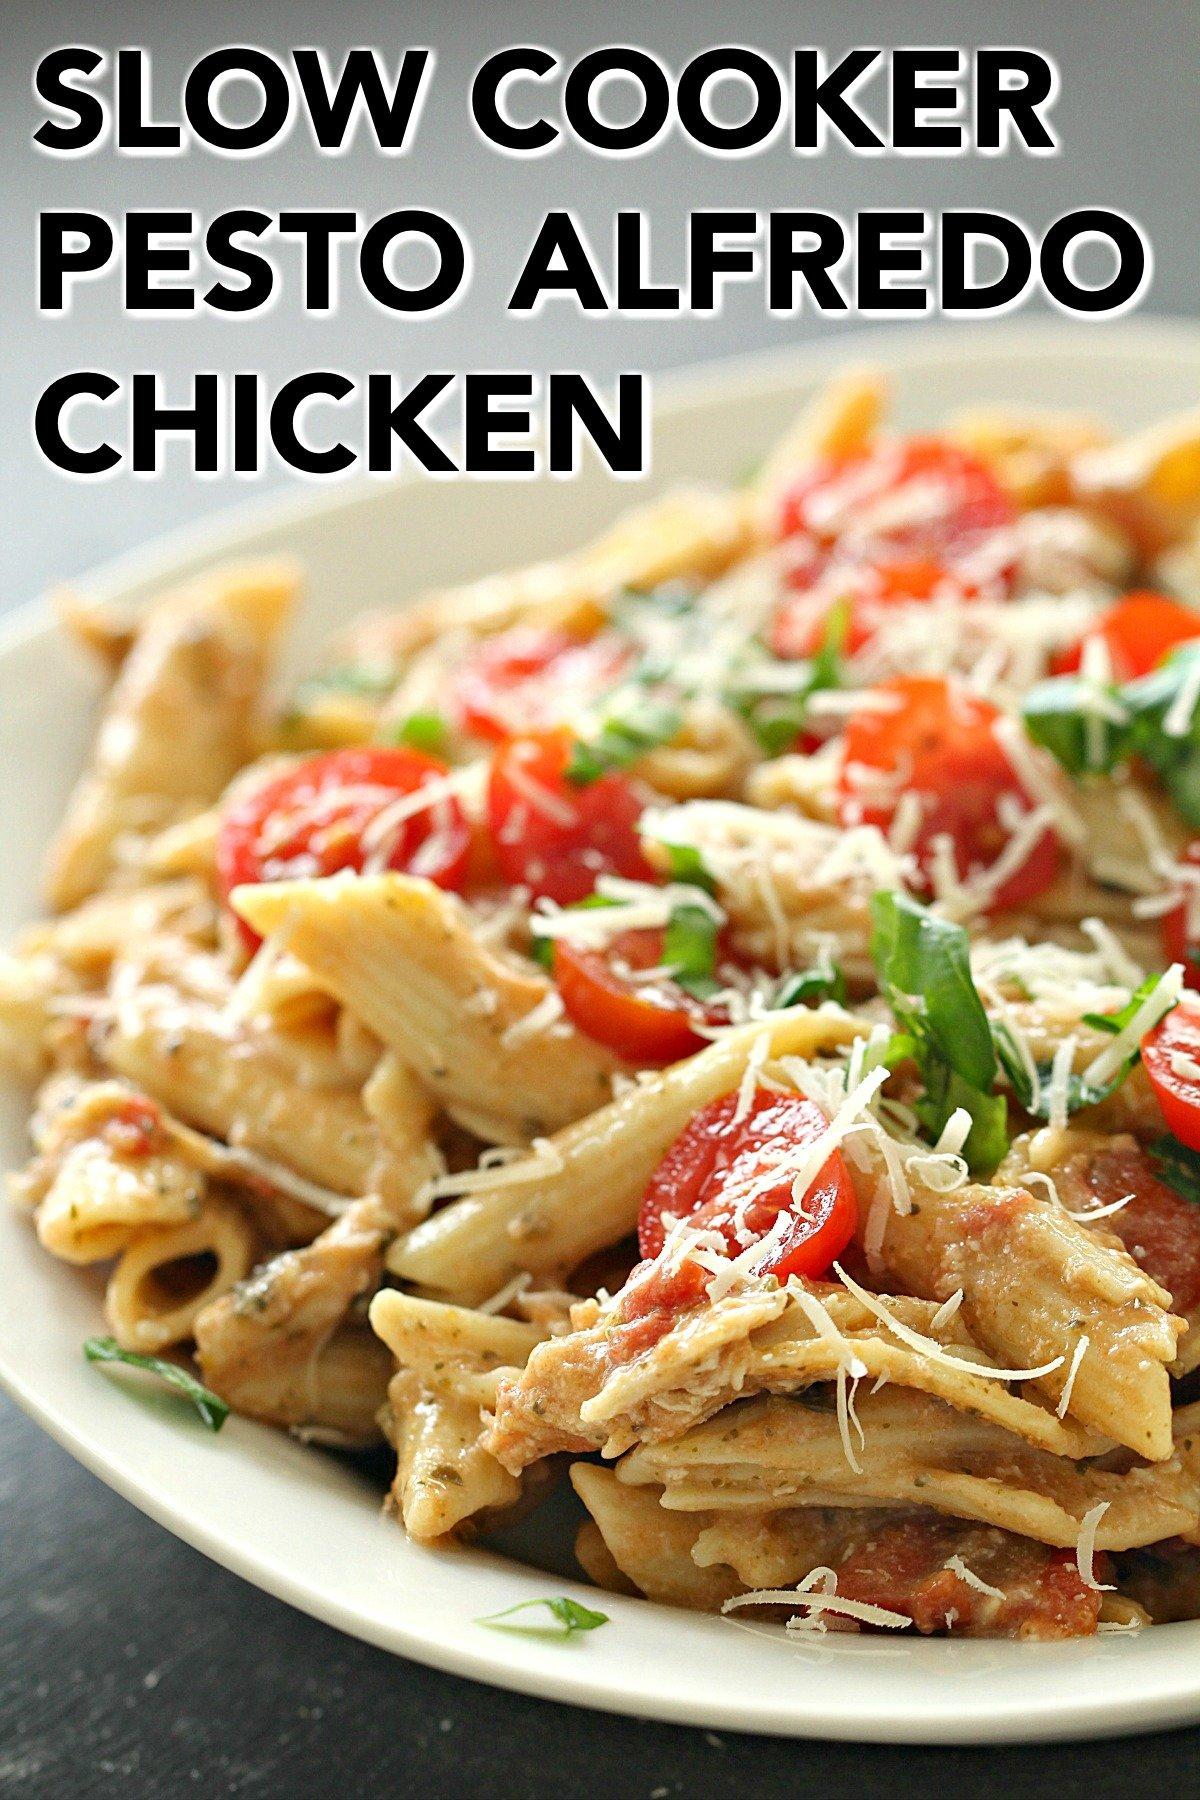 Slow Cooker Alfredo Pesto Chicken and Pasta